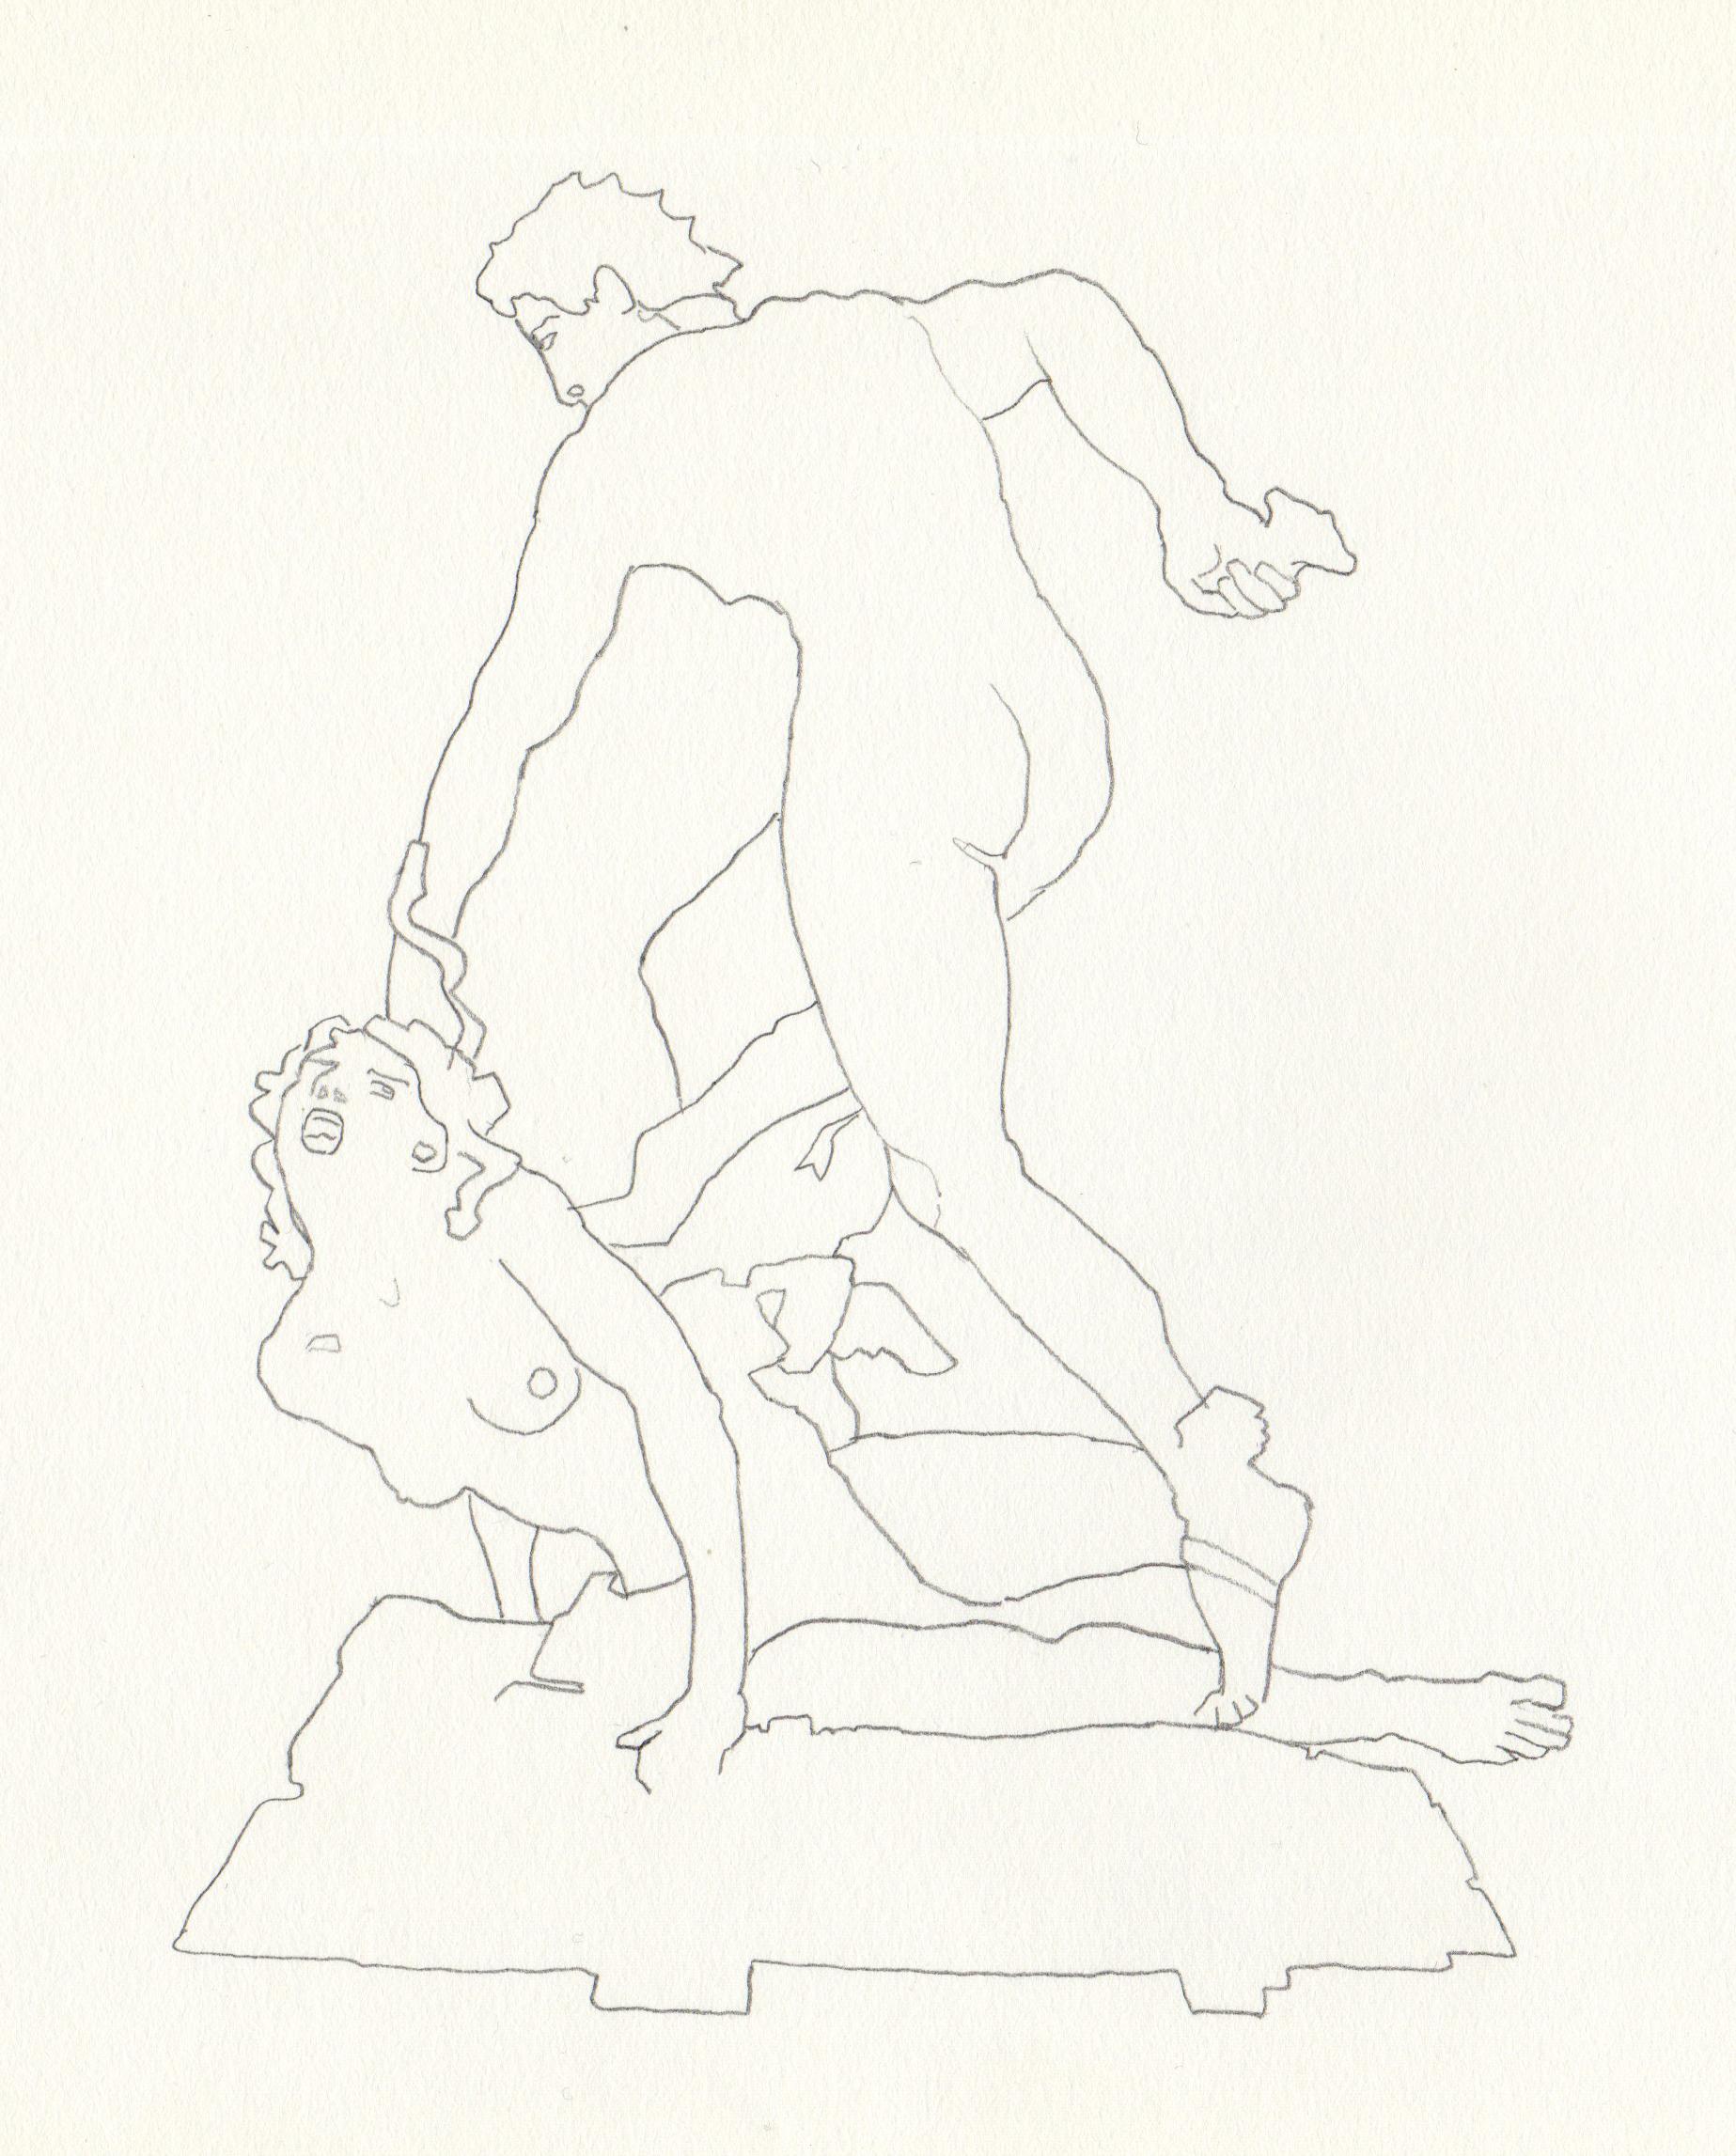 2012_Sketch_F-Beudin_061